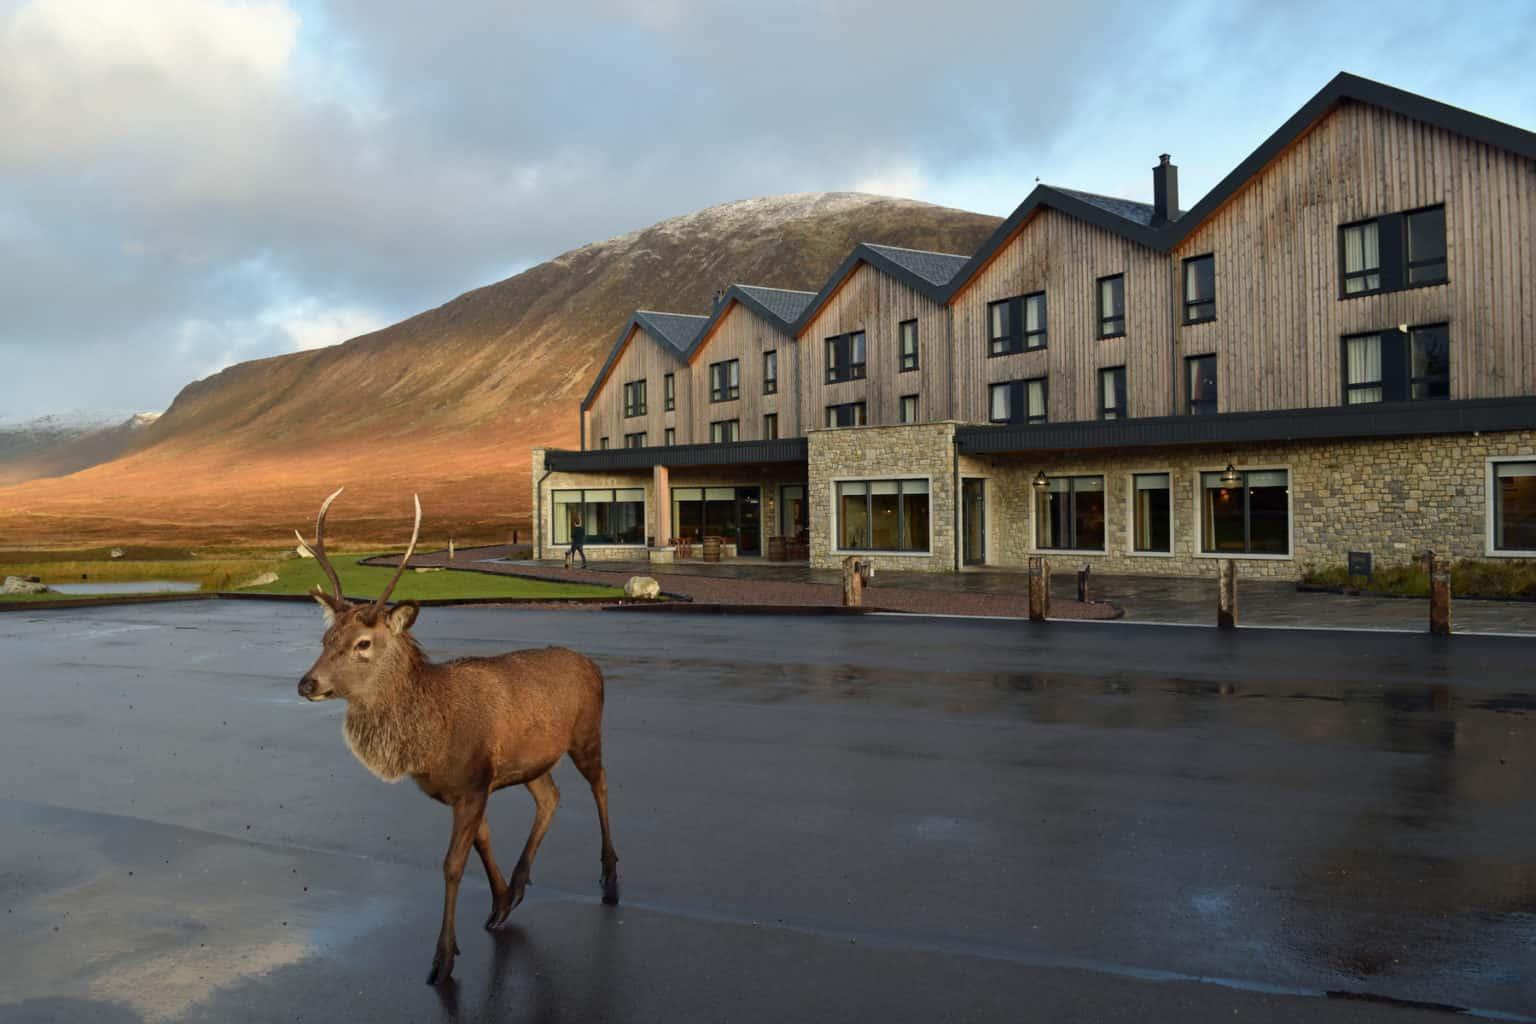 King's House Hotel, Glencoe